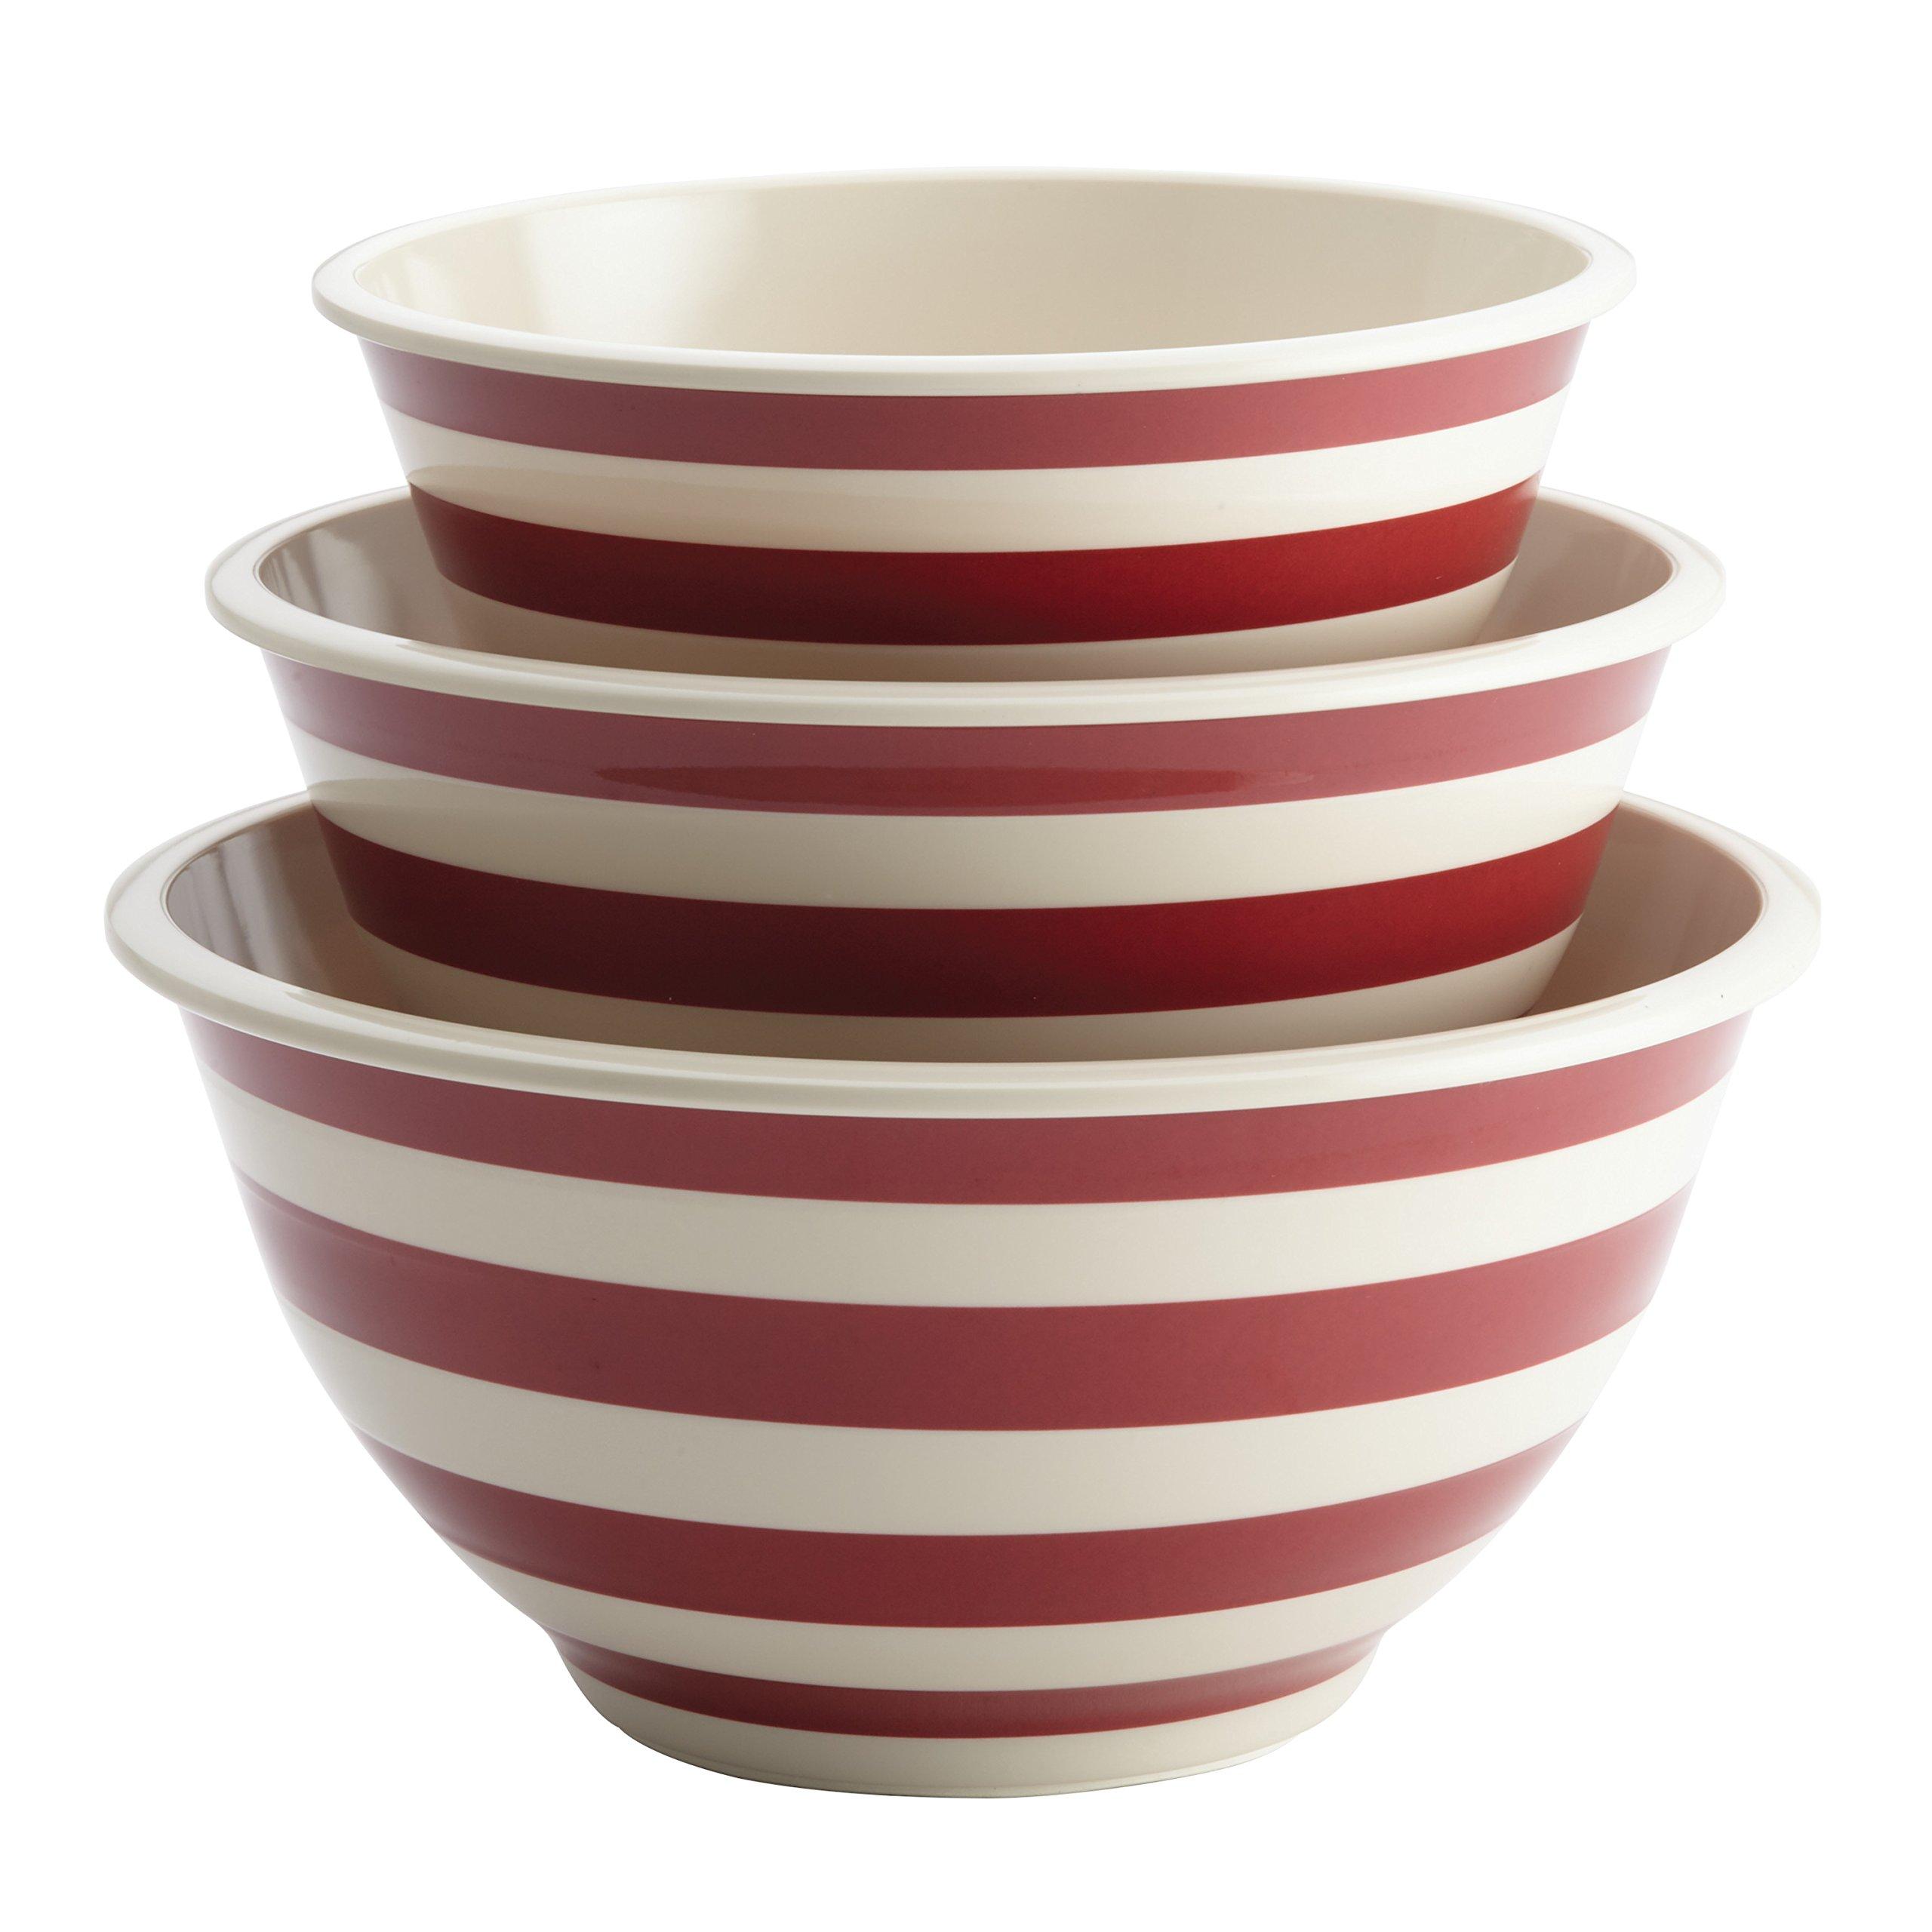 Paula Deen Pantryware Melamine Mixing Bowl Set, 3-Piece, Striped Red